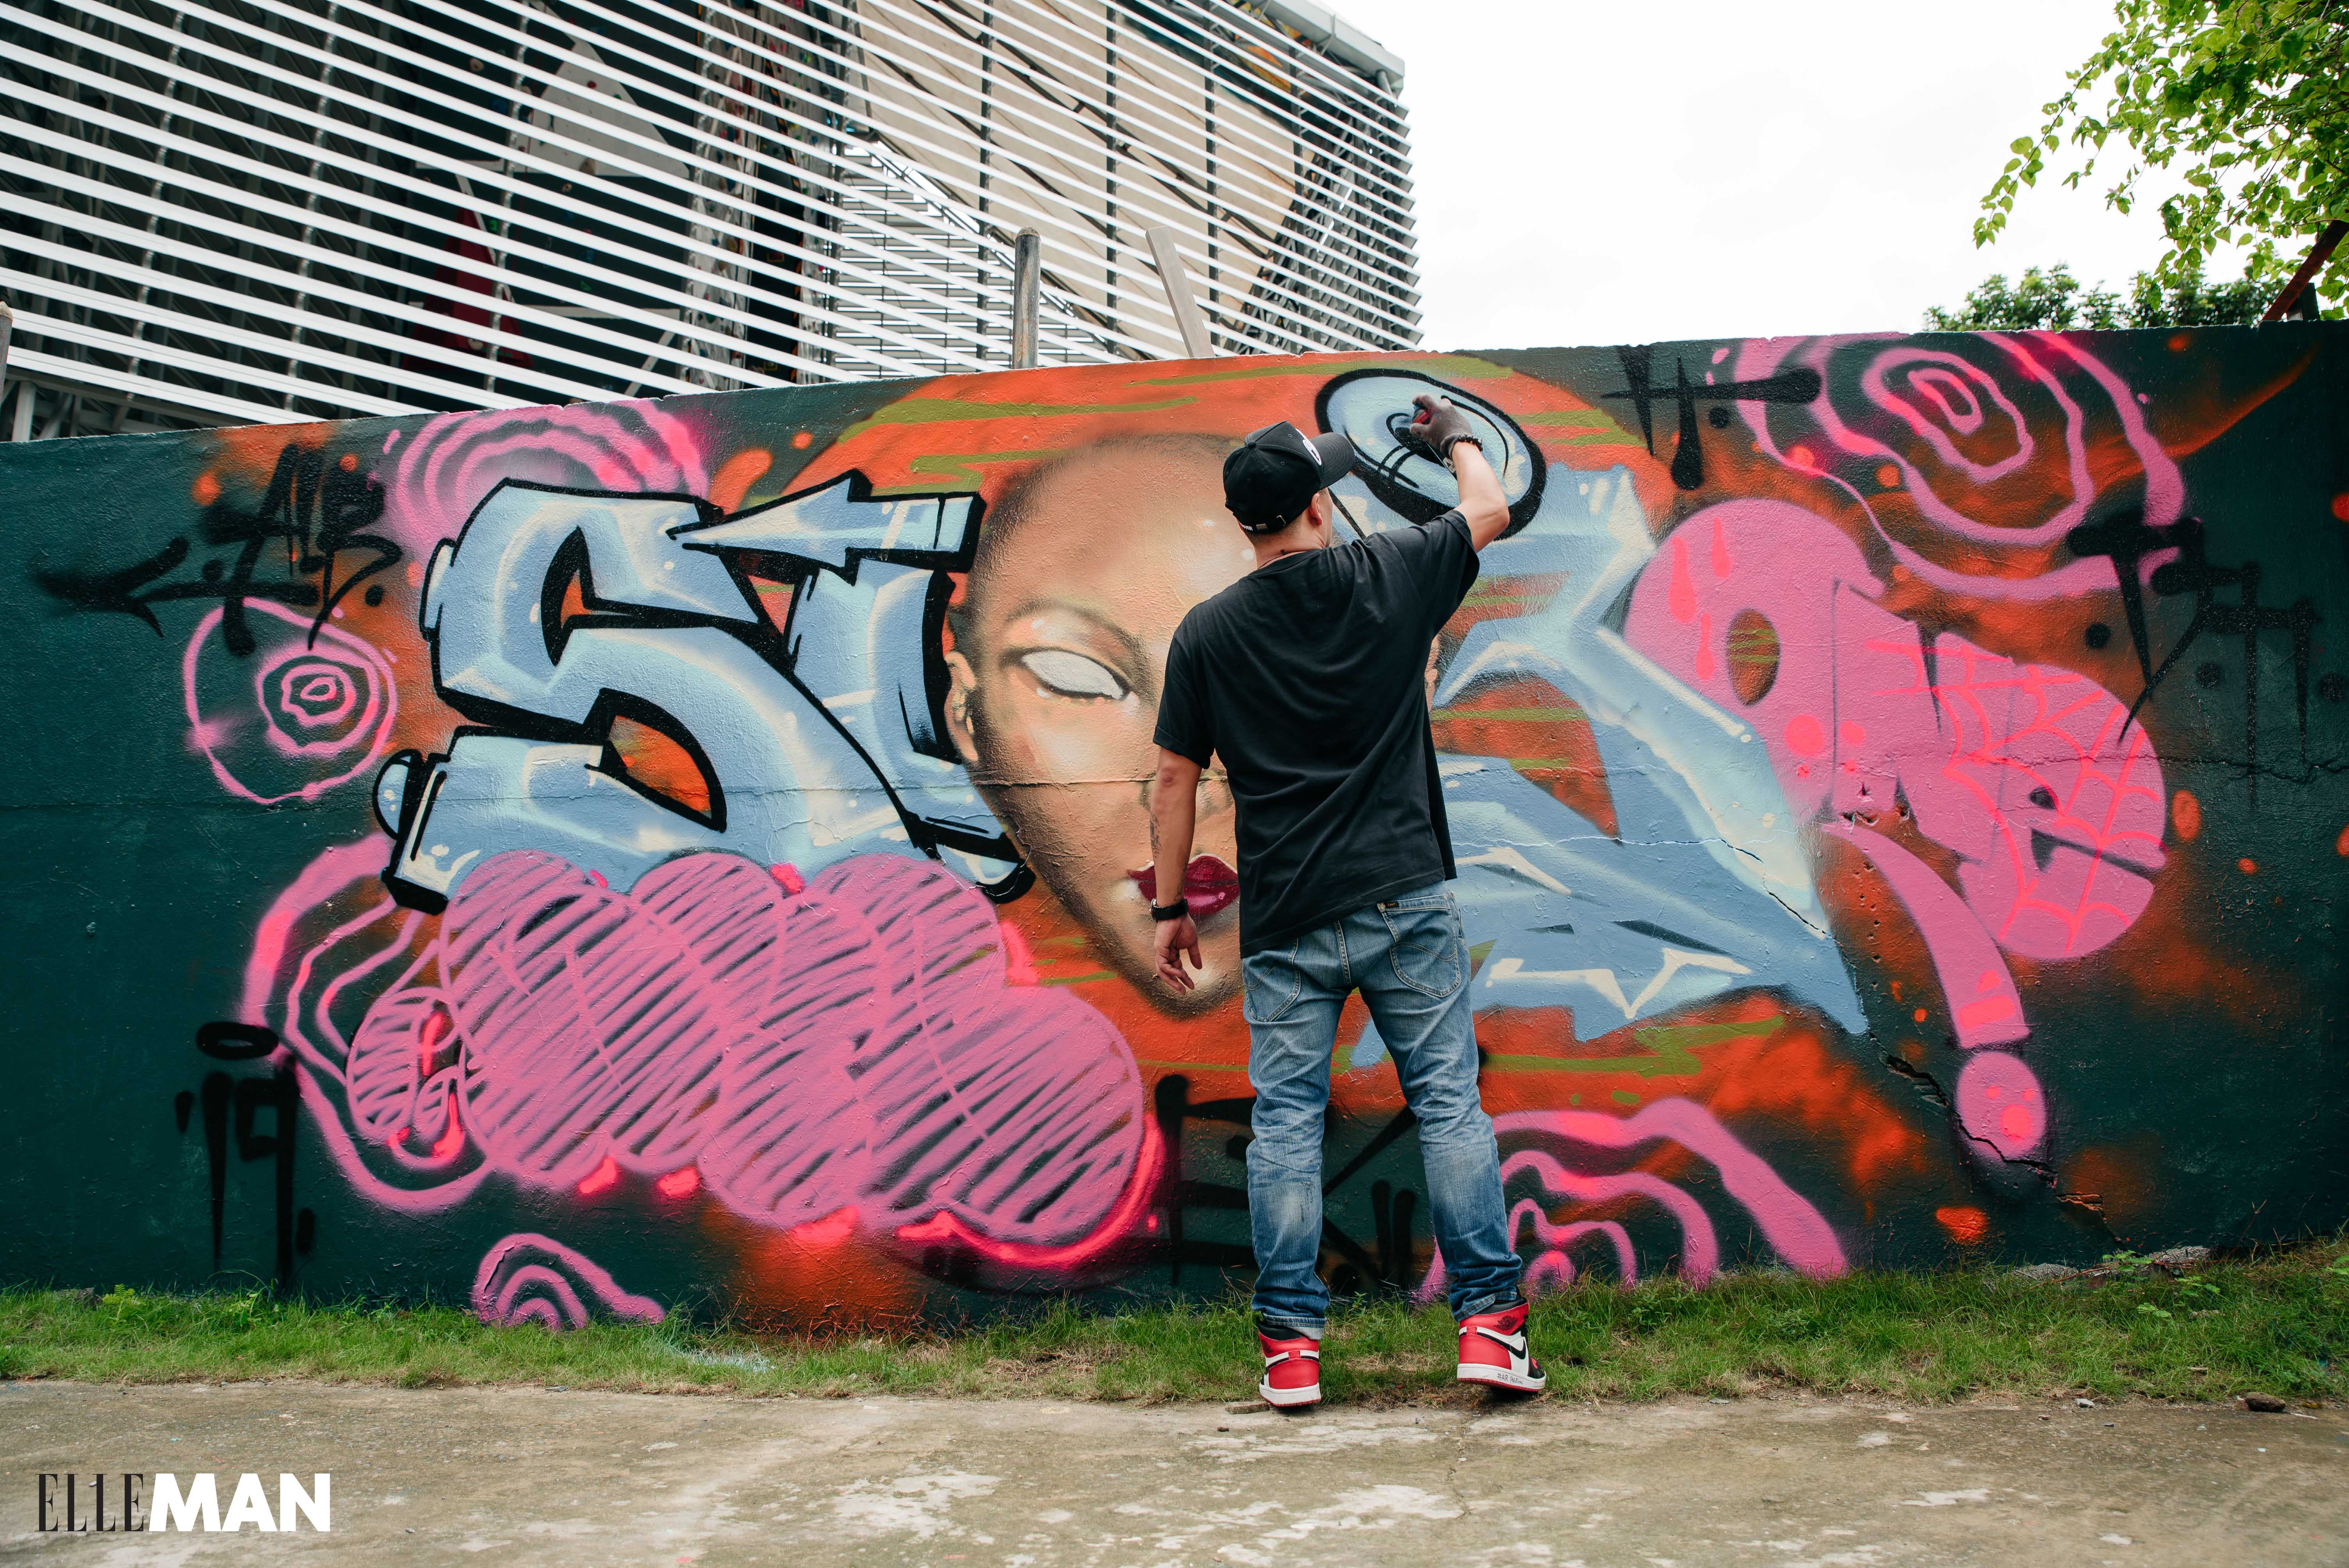 nghe si graffiti Suby - elle man 4